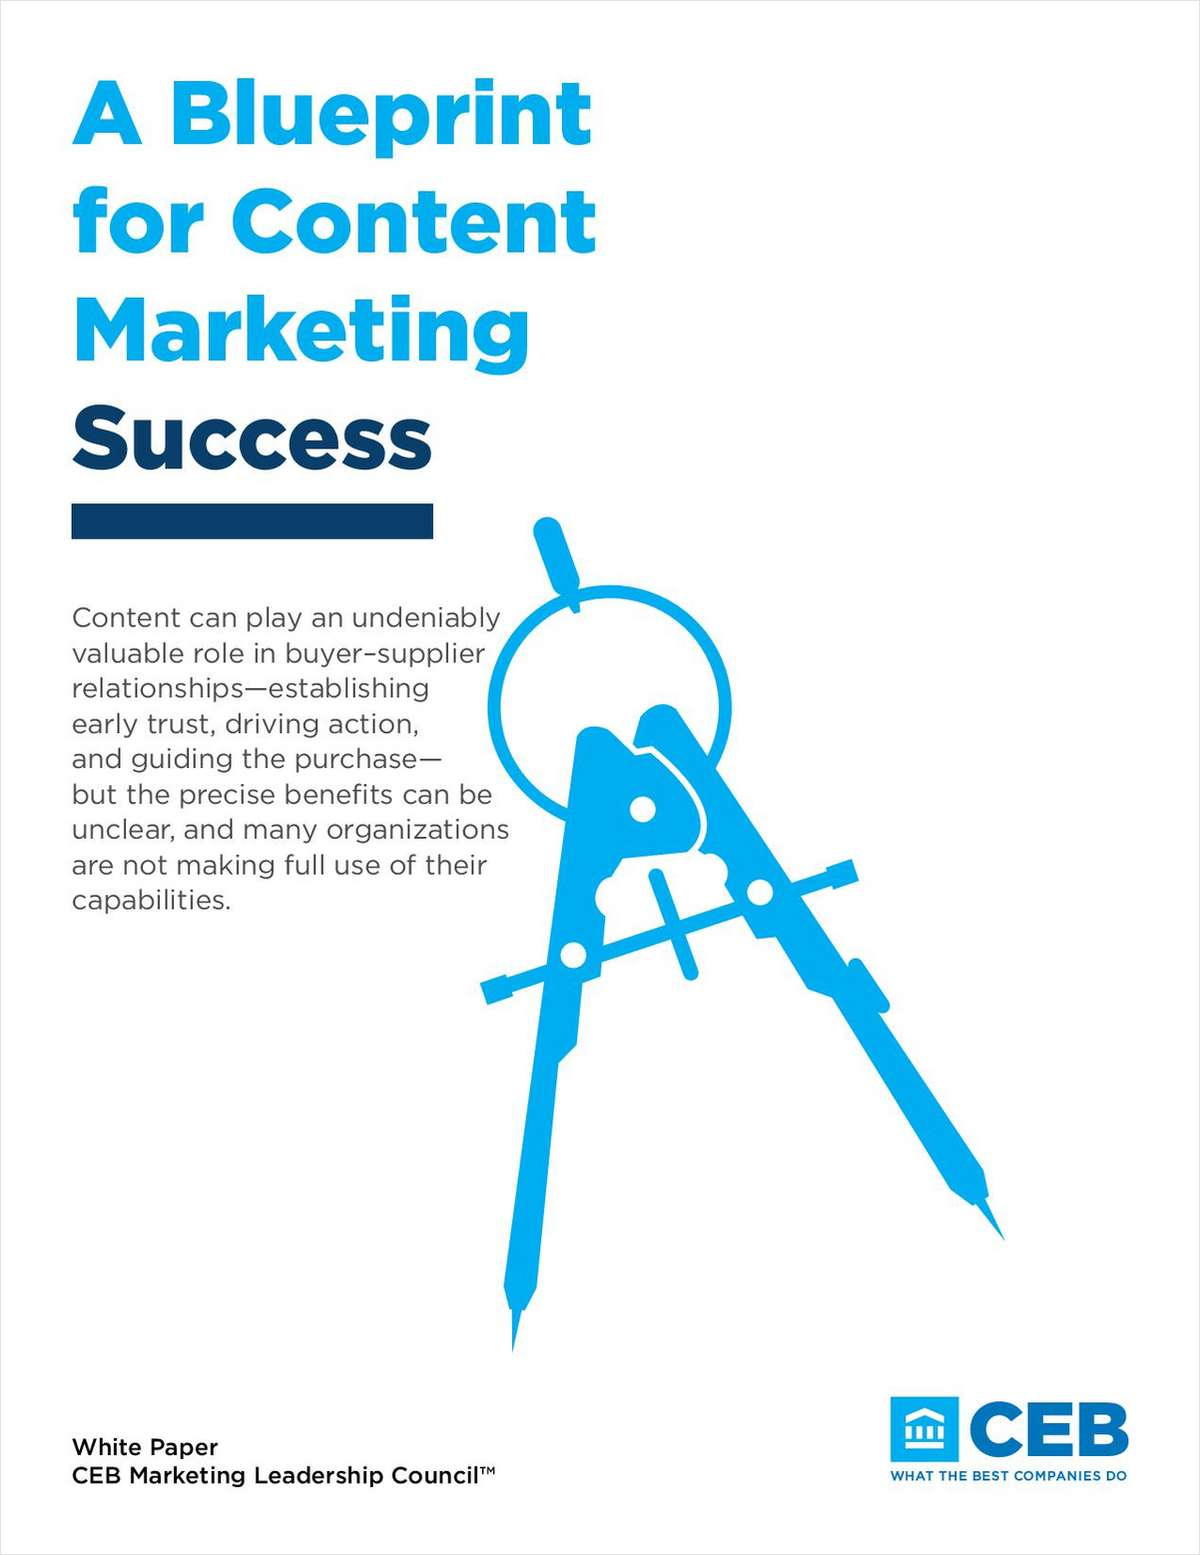 A Blueprint for Content Marketing Success